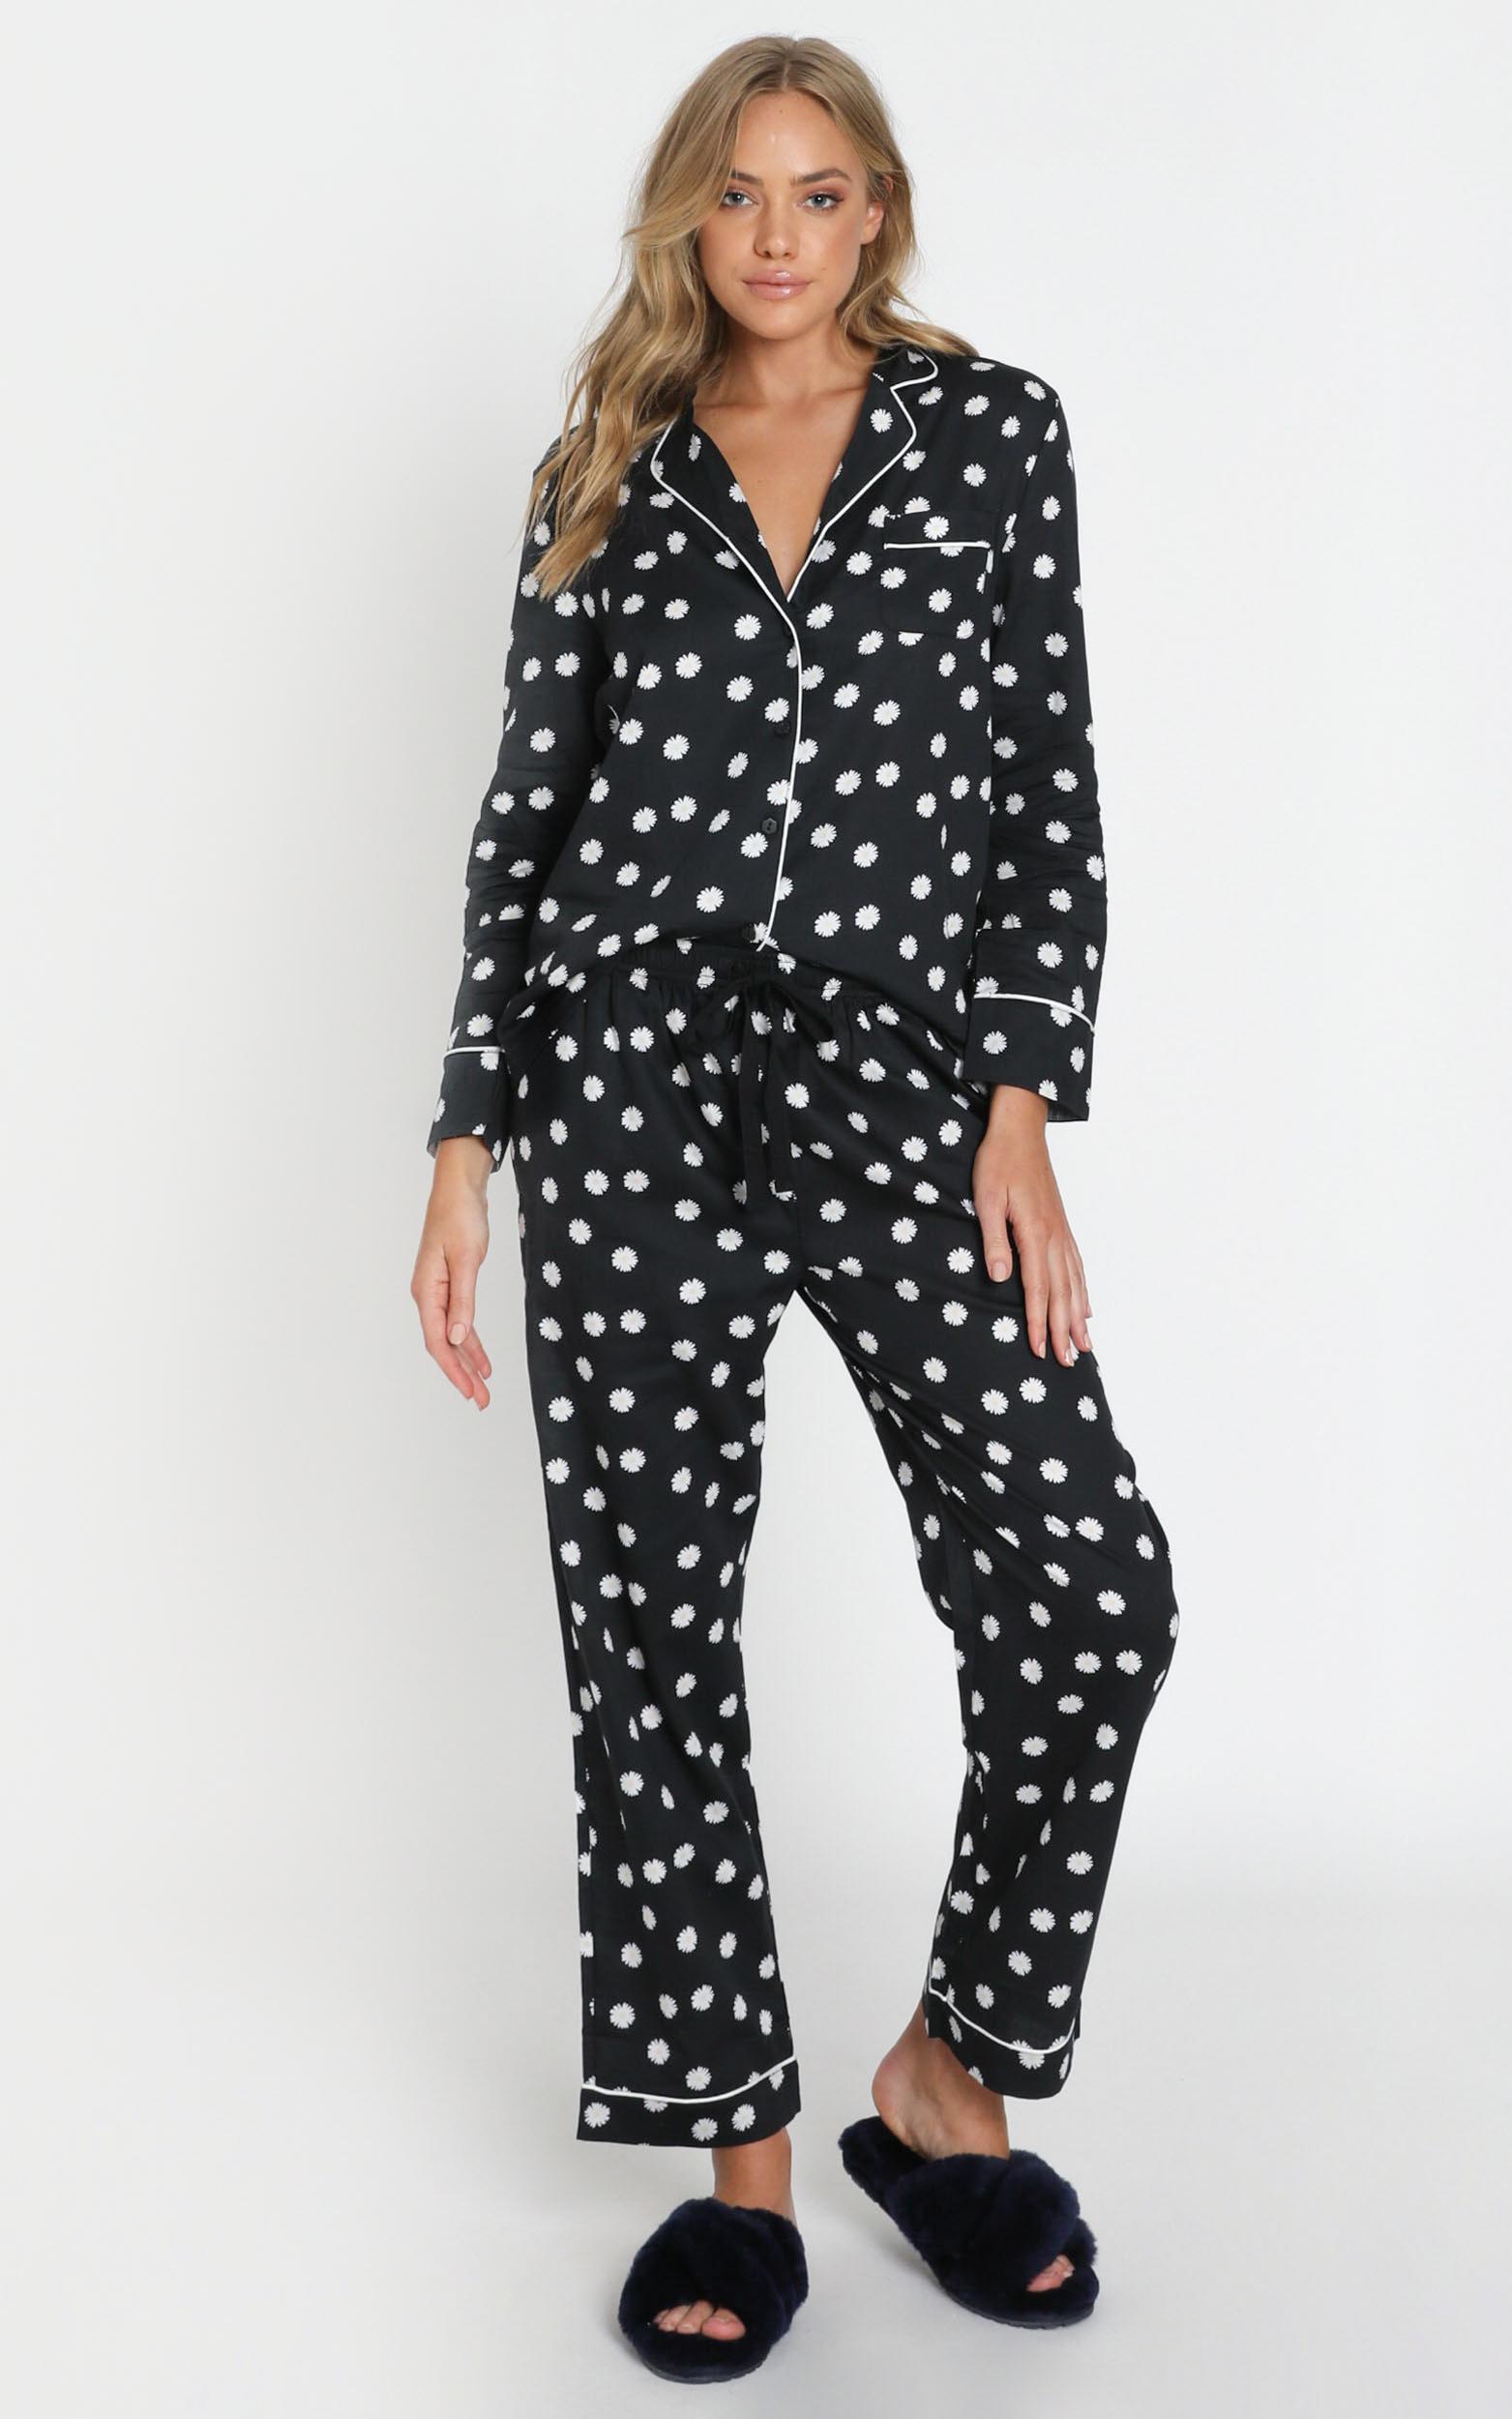 Project REM Pyjama Set in Black Daisy - 6 (XS), Black, hi-res image number null